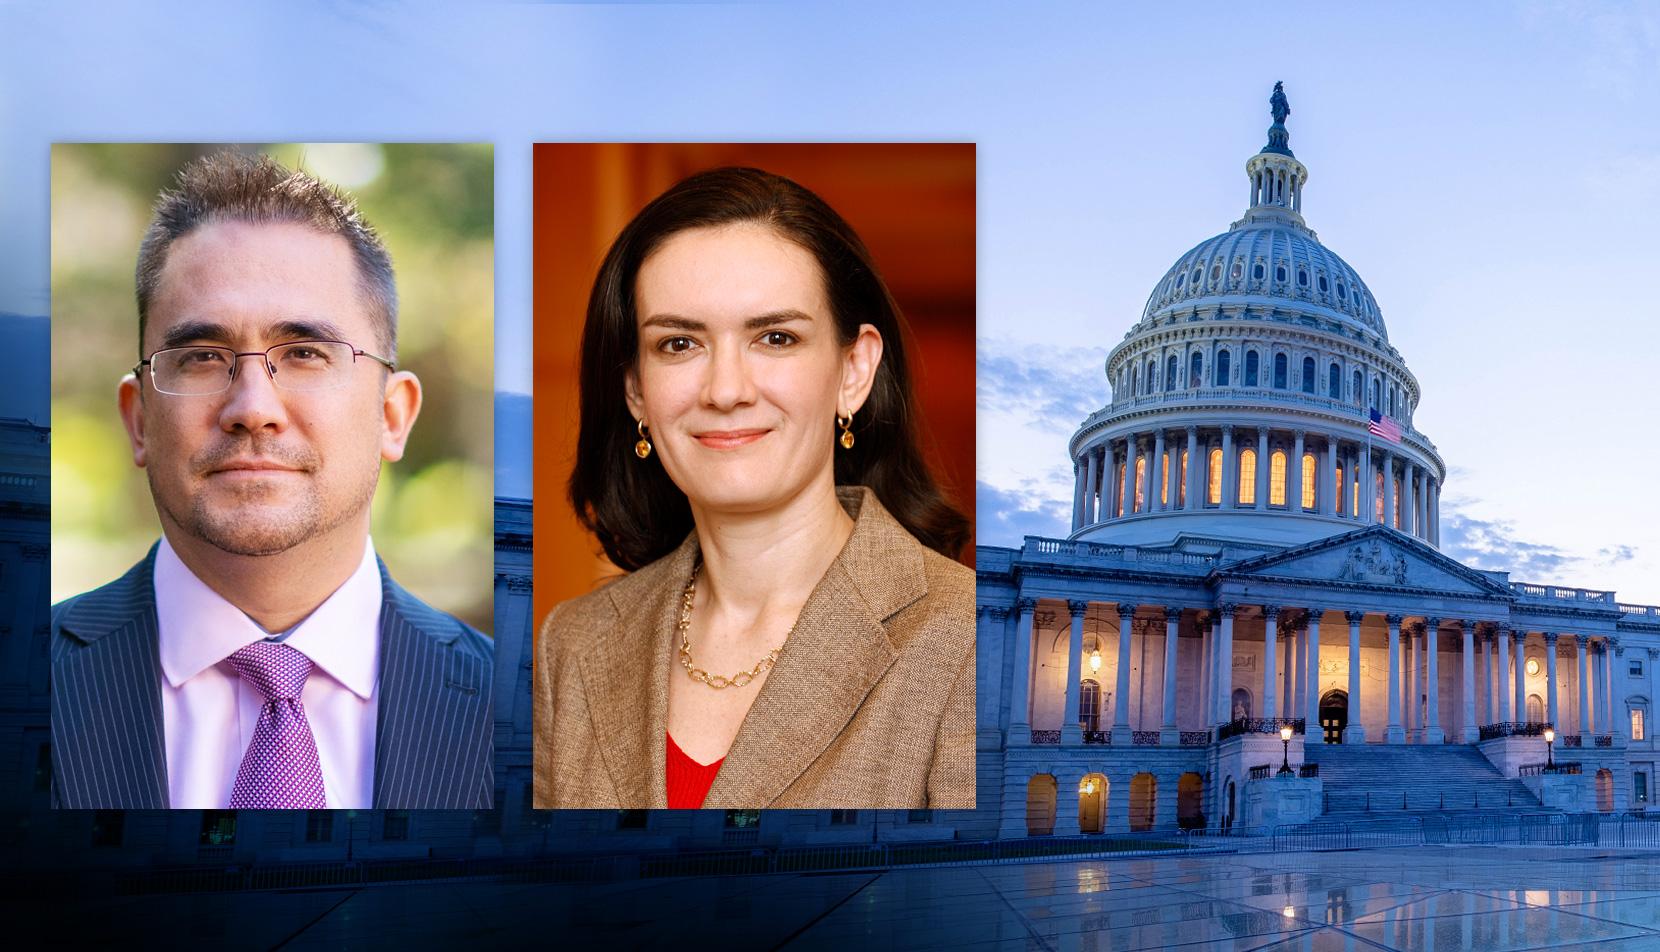 Andrew Hayashi, Ruth Mason and U.S. Capitol